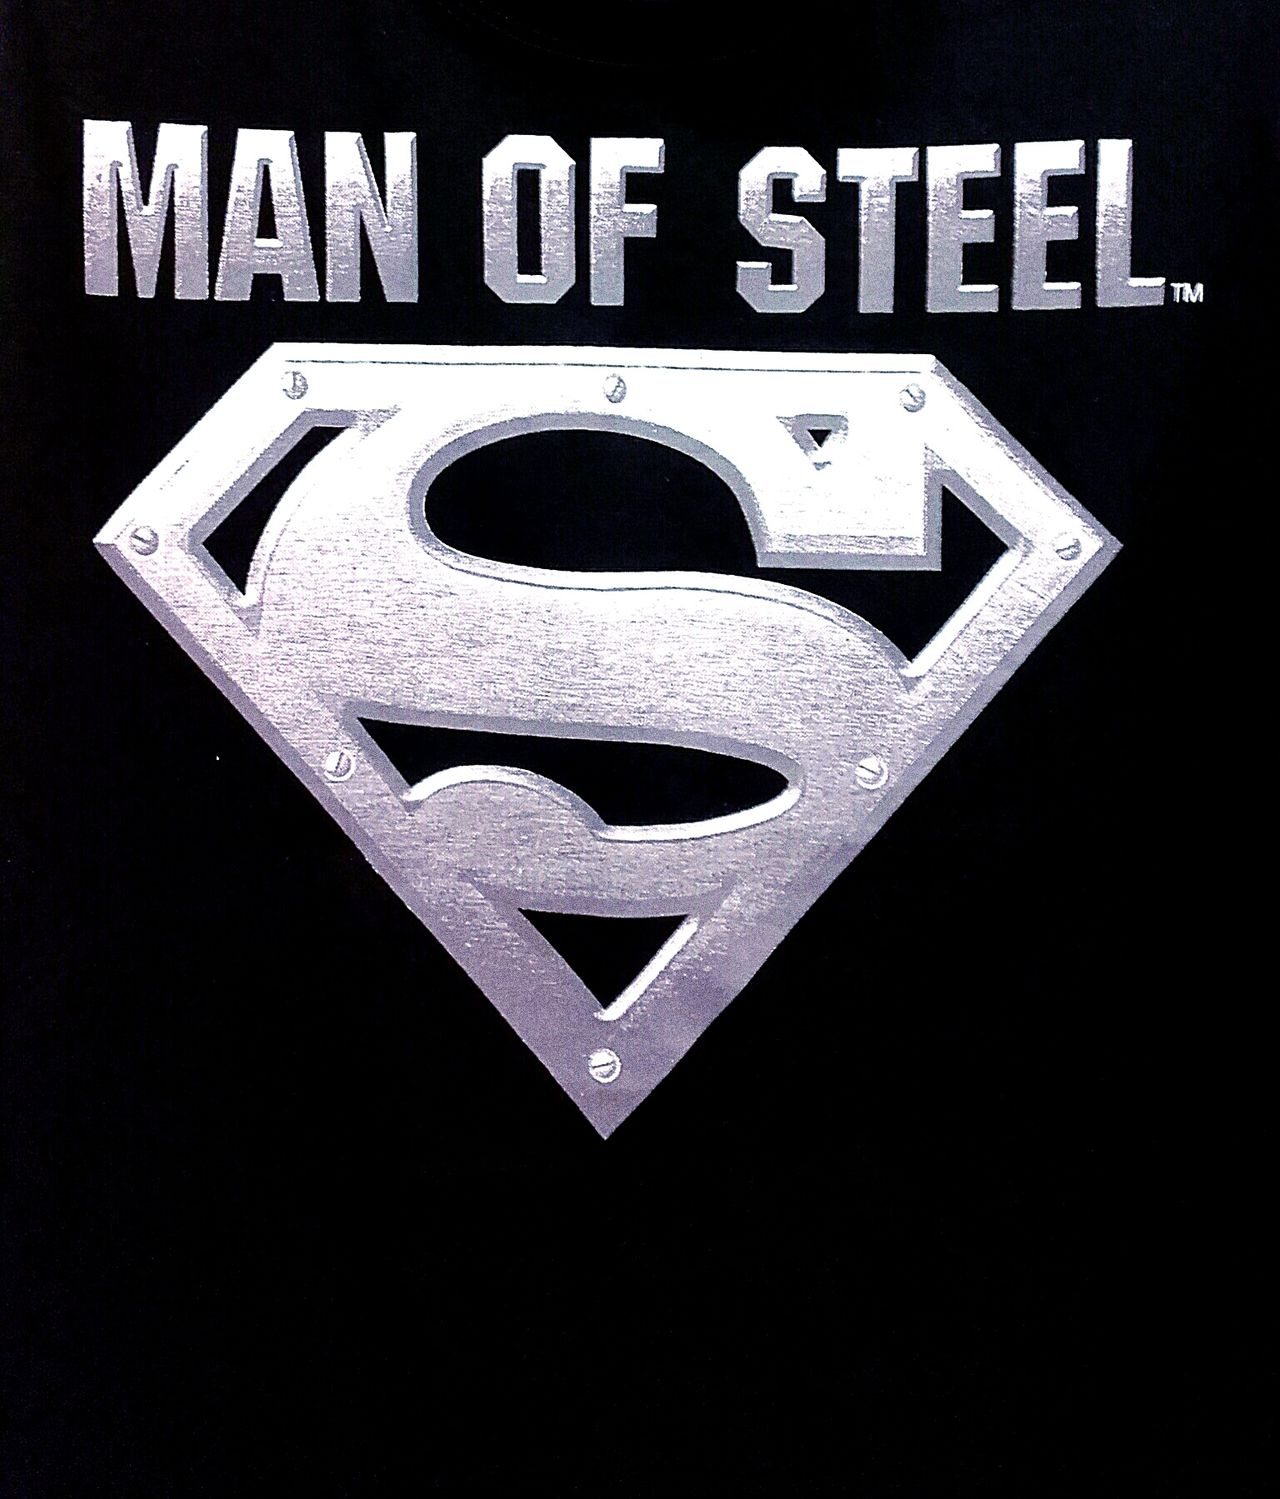 Man Of Steel Superman T Shirt Tshirts Tshirt T Shirt Collection Manofsteel T Shirts Tee Shirt Superman Tshirt♡ Tshirtoftheday Tshirtcollection T Shirt Super Hero TshirtQuotes Superheroes SupermanPorn S Tshirtporn Teeshirt Tee Shirts Teeshirts Tees Man O' Steel